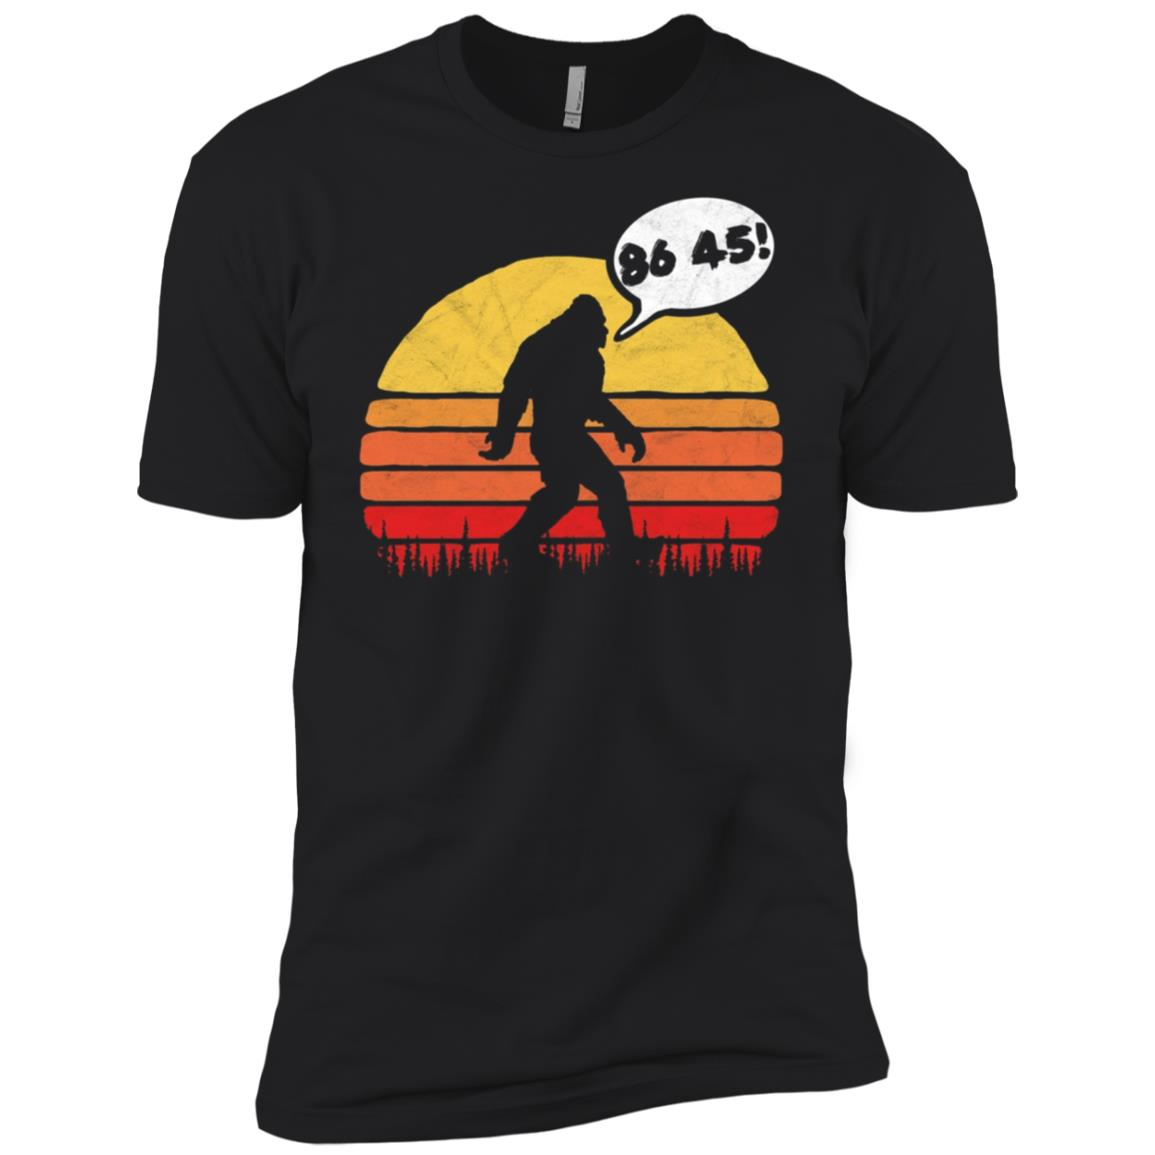 Bigfoot 86 45 Sasquatch Anti-Trump Vintage Men Short Sleeve T-Shirt